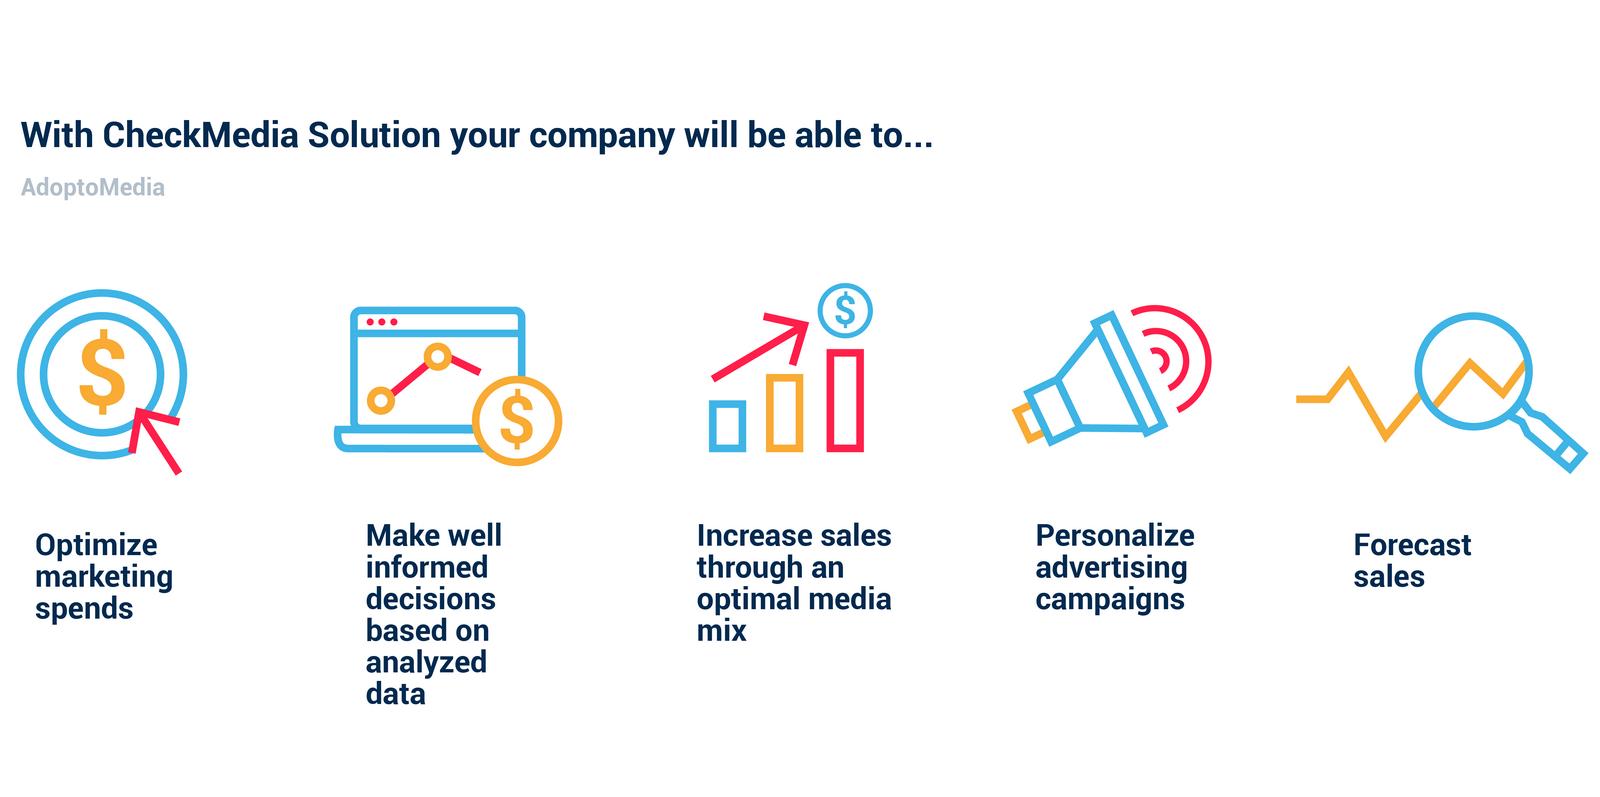 Marketing Mix Modelling, Marketing Technology, ROMI optimization, ROMI increase, marketing budget optimization, effective marketing strategy, CheckMedia Solution, AdoptoMedia, forecast sales